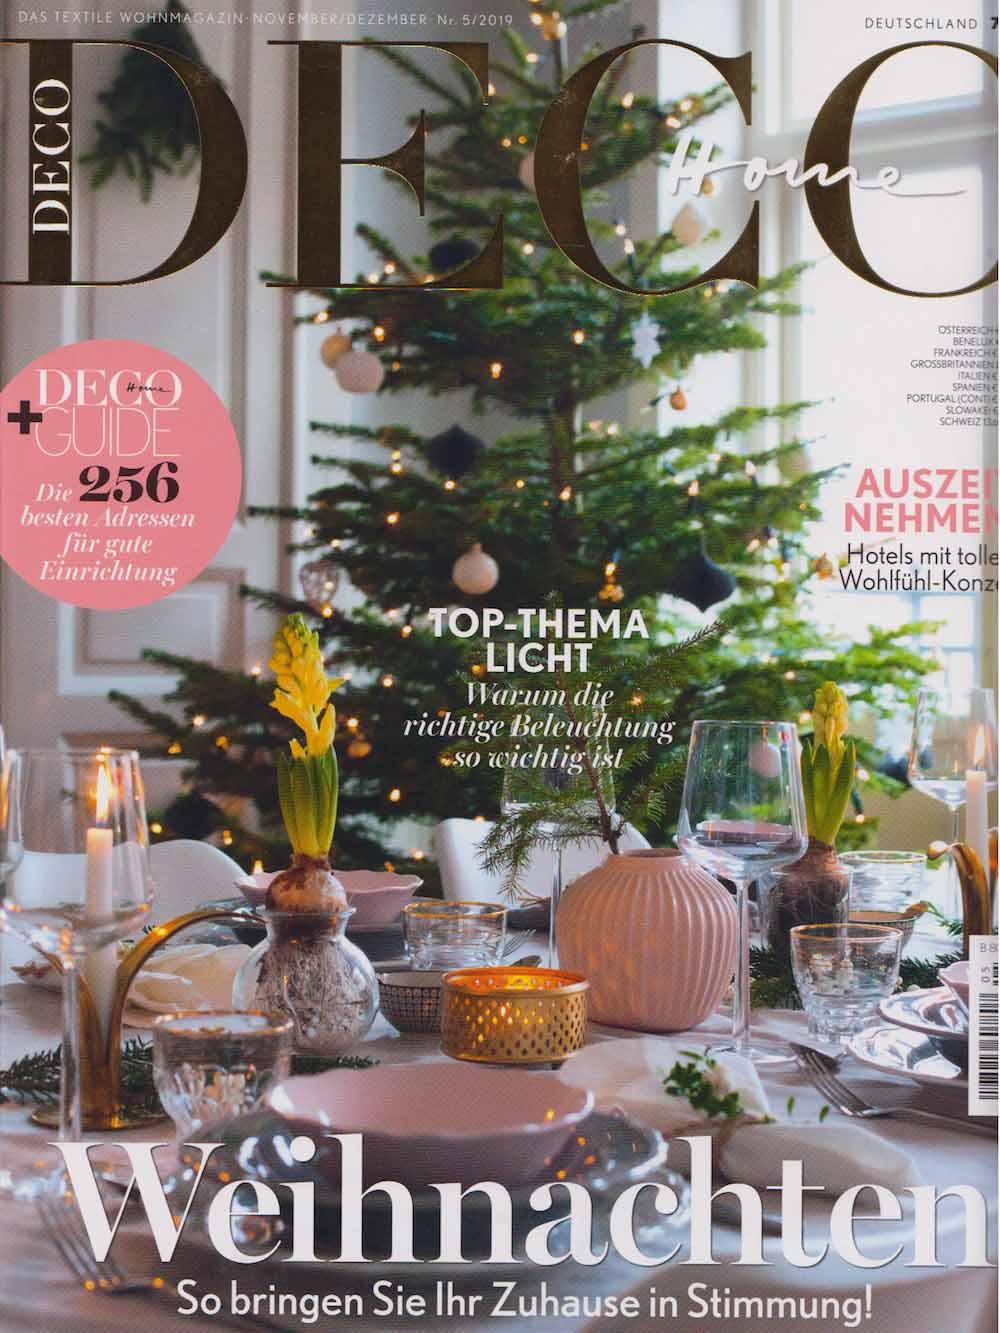 DECO_Home_2019_12_11_Cover